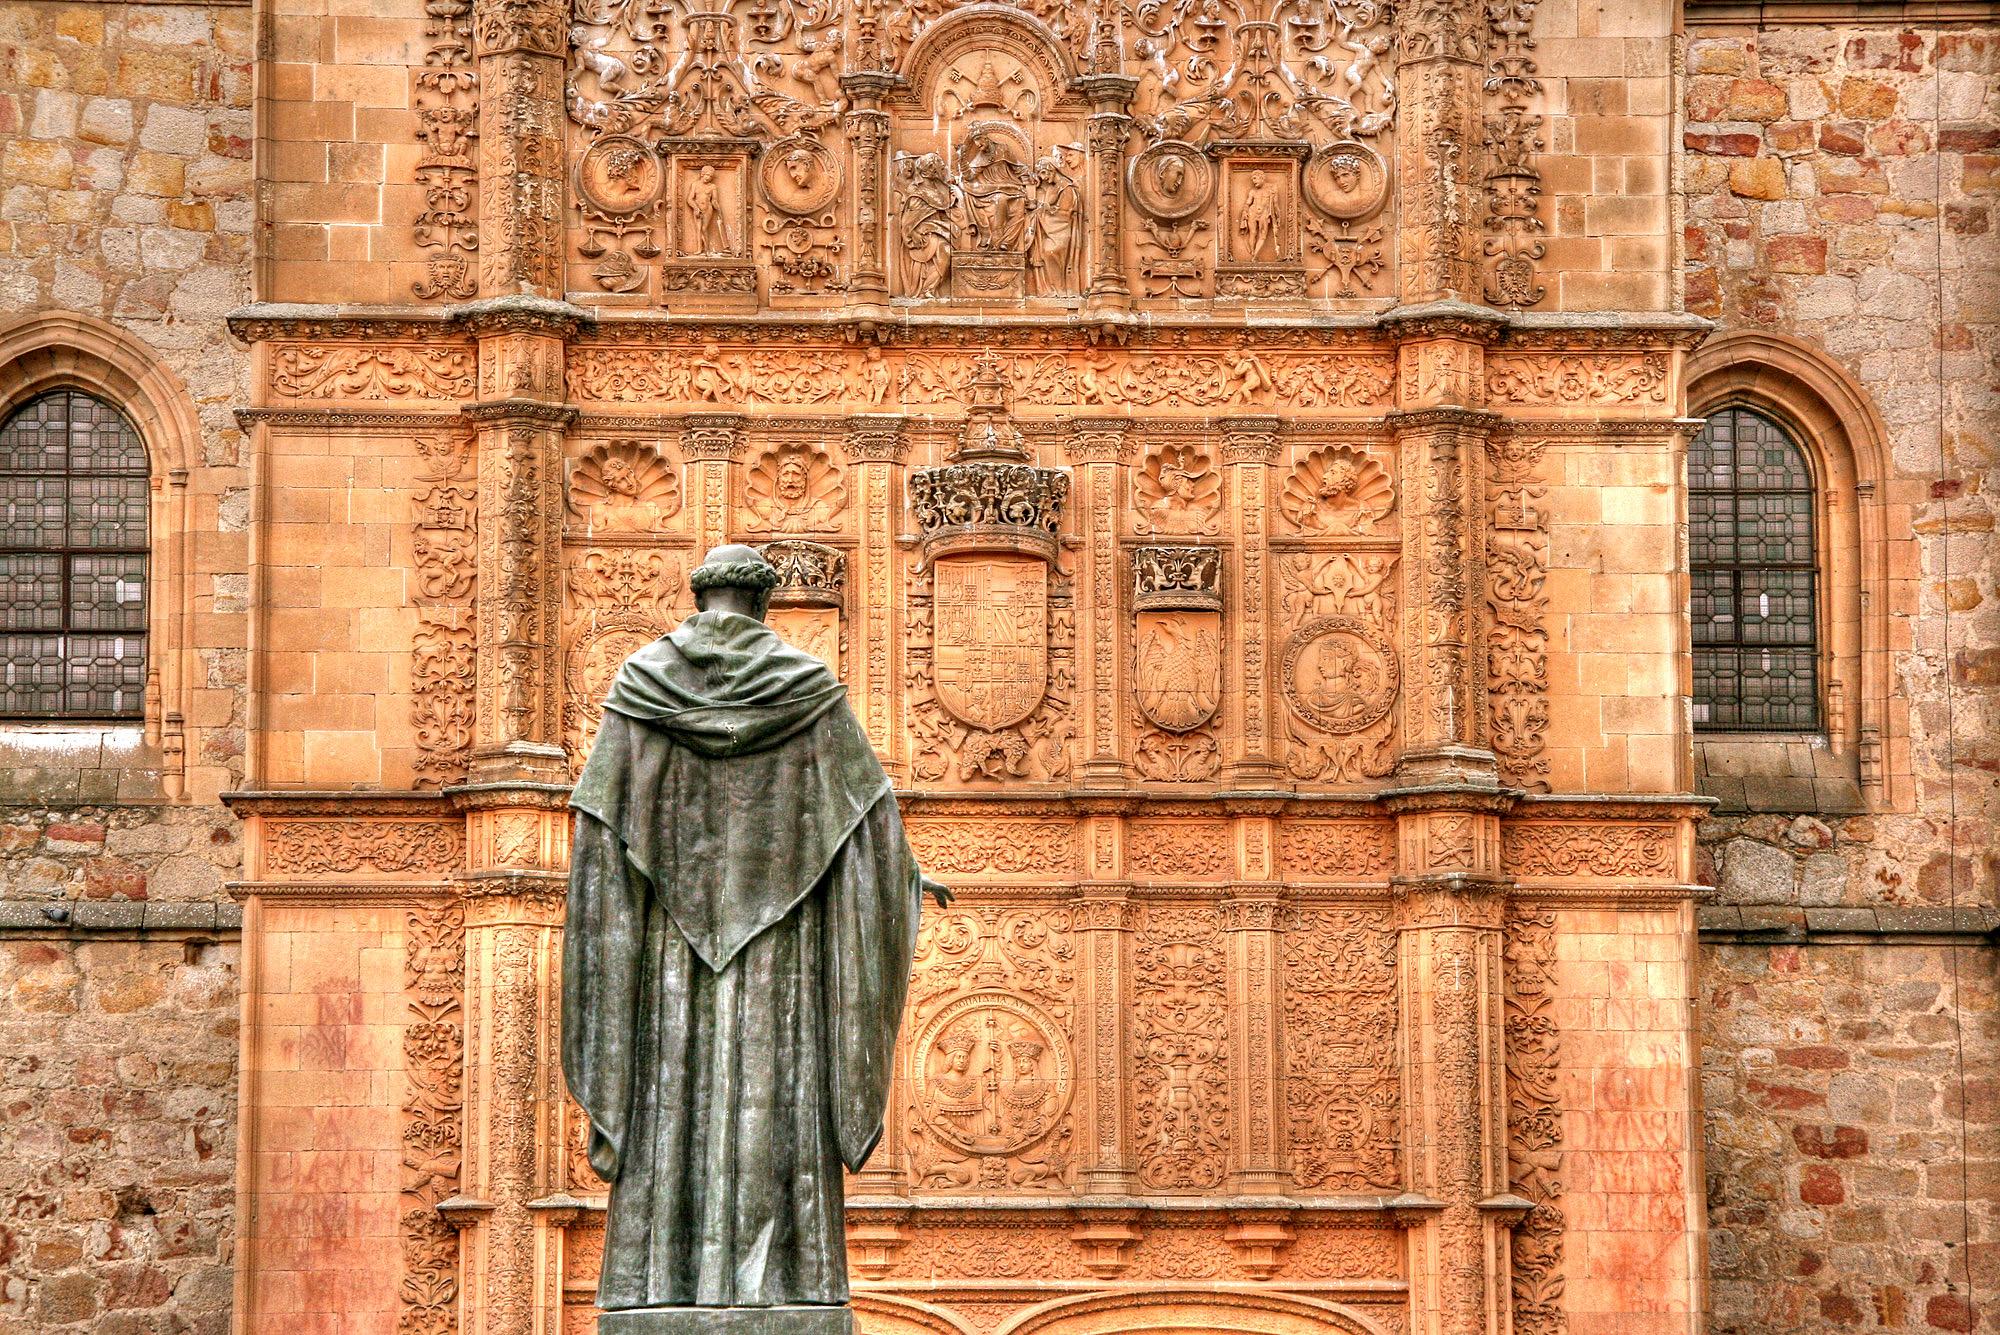 Universidad de Salamanca. La universidad por antonomasia.